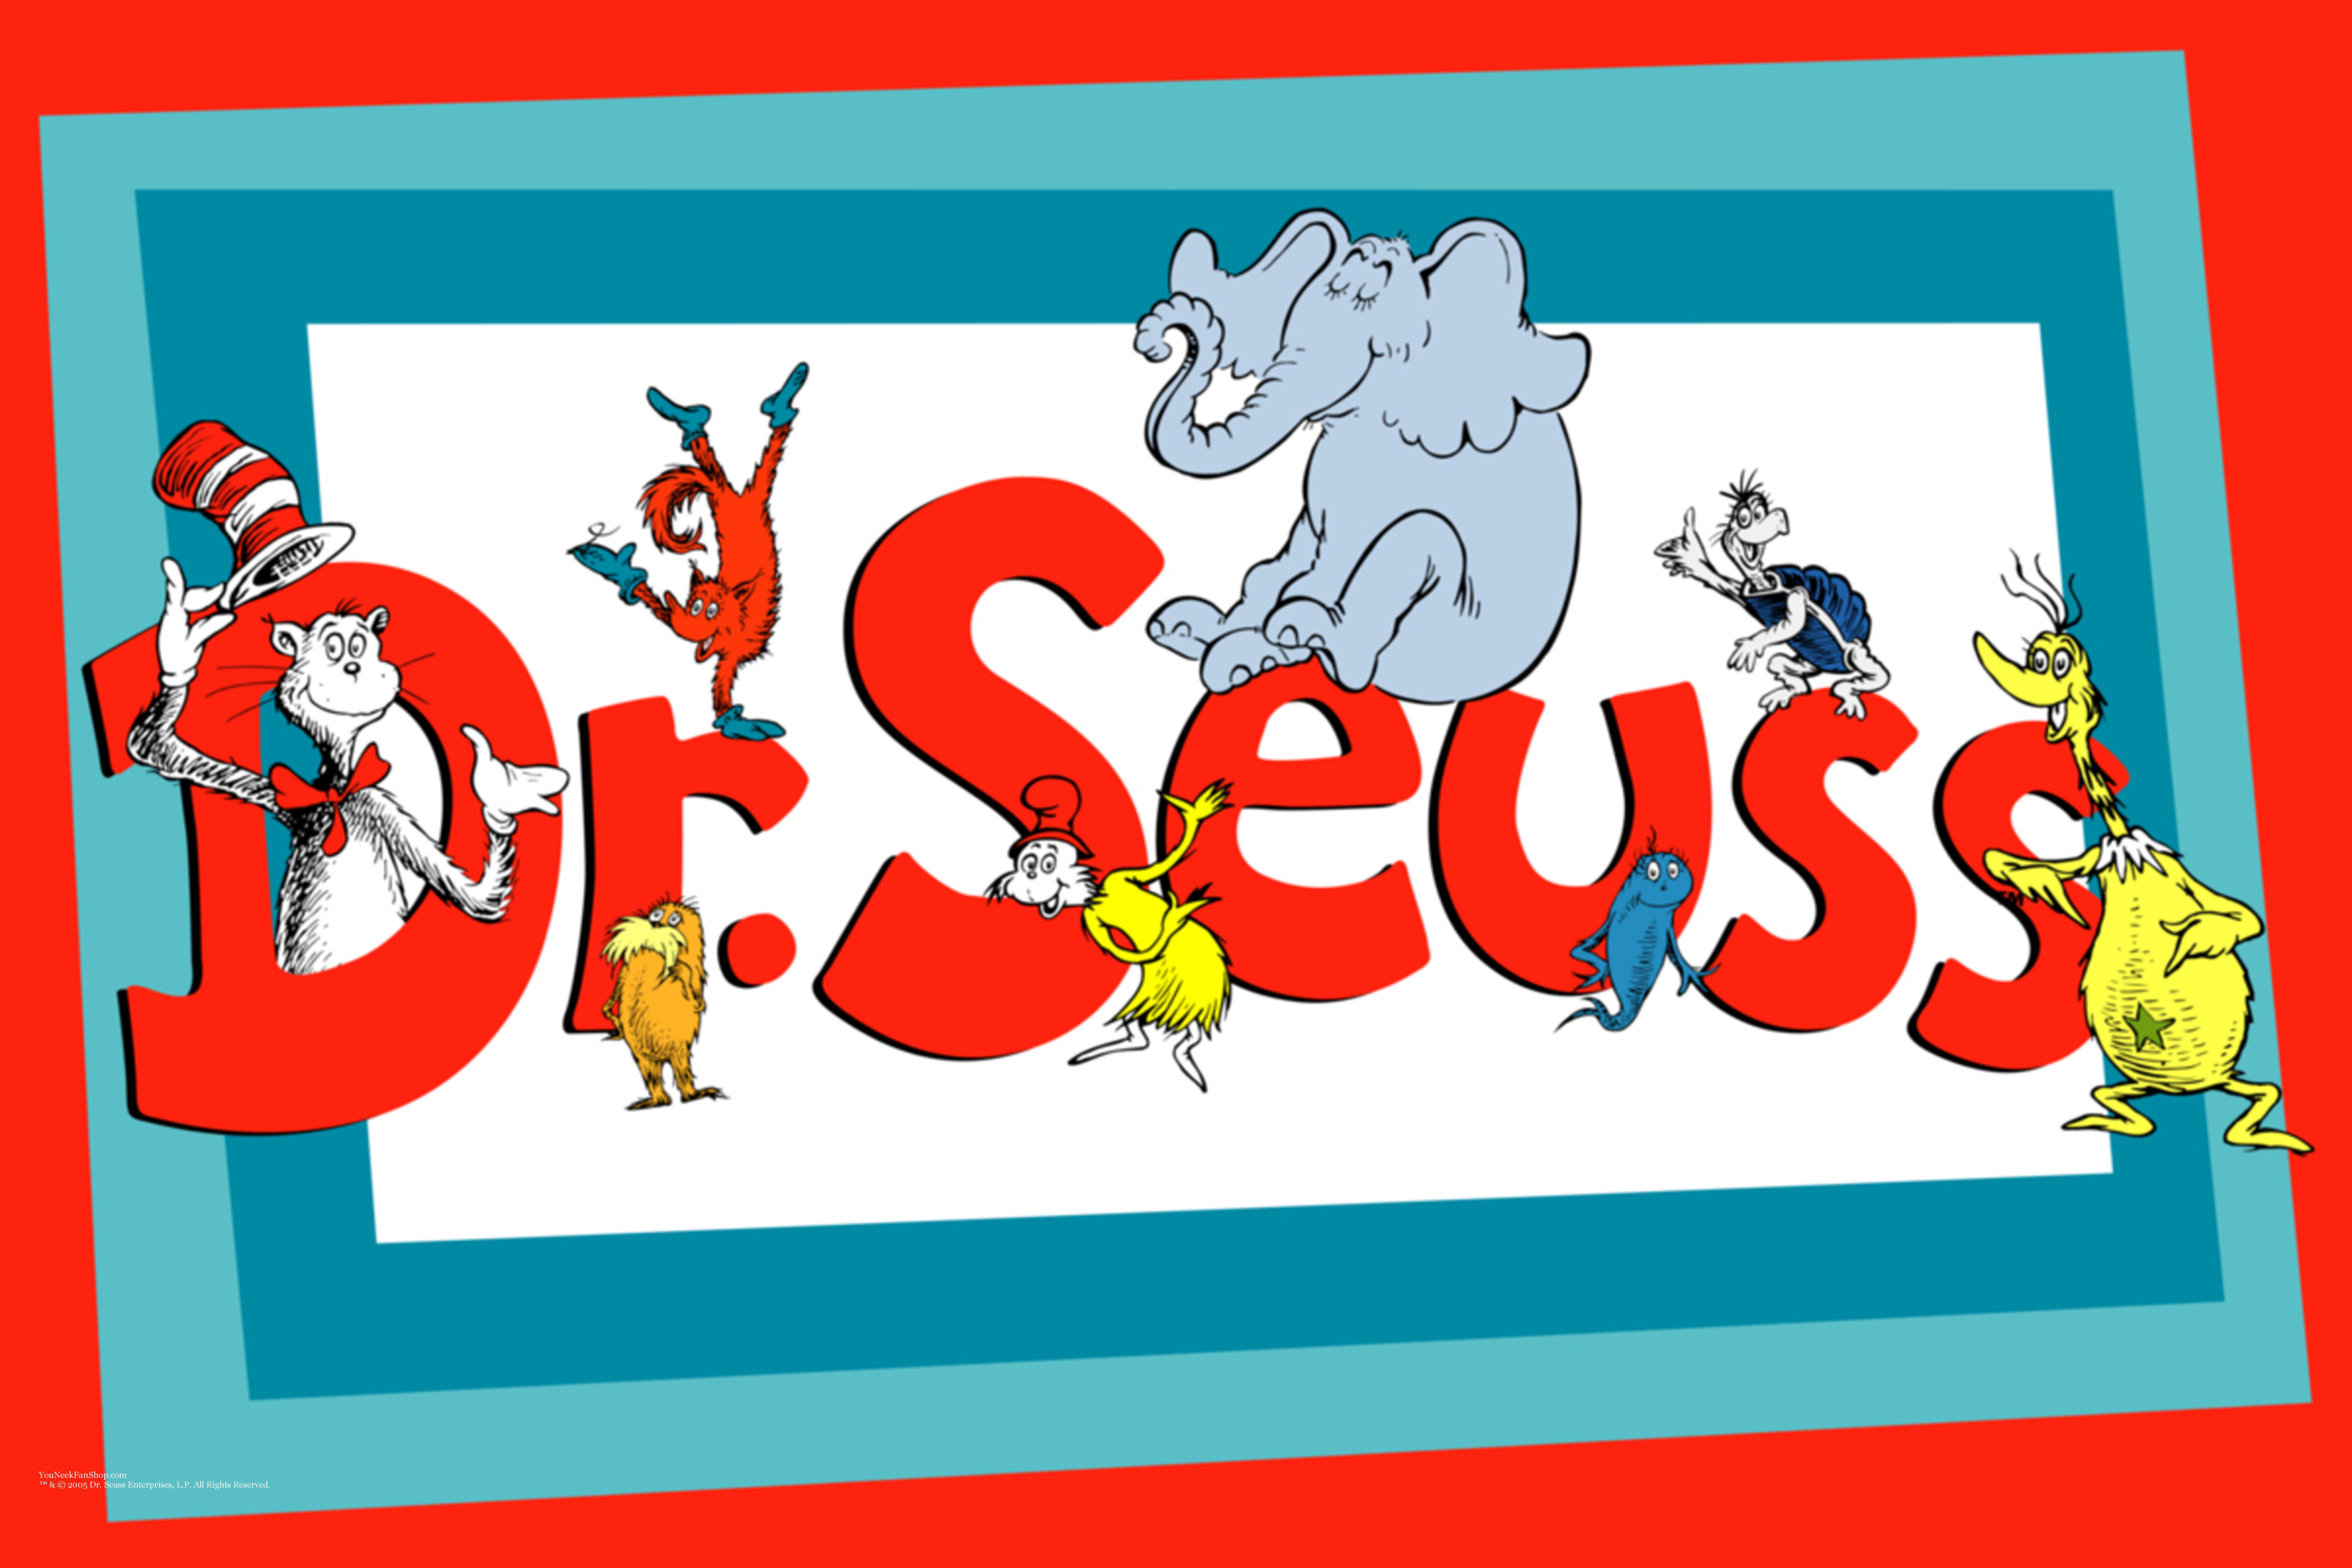 Tattoos Inspired by Dr. Seuss | Tattoo.com